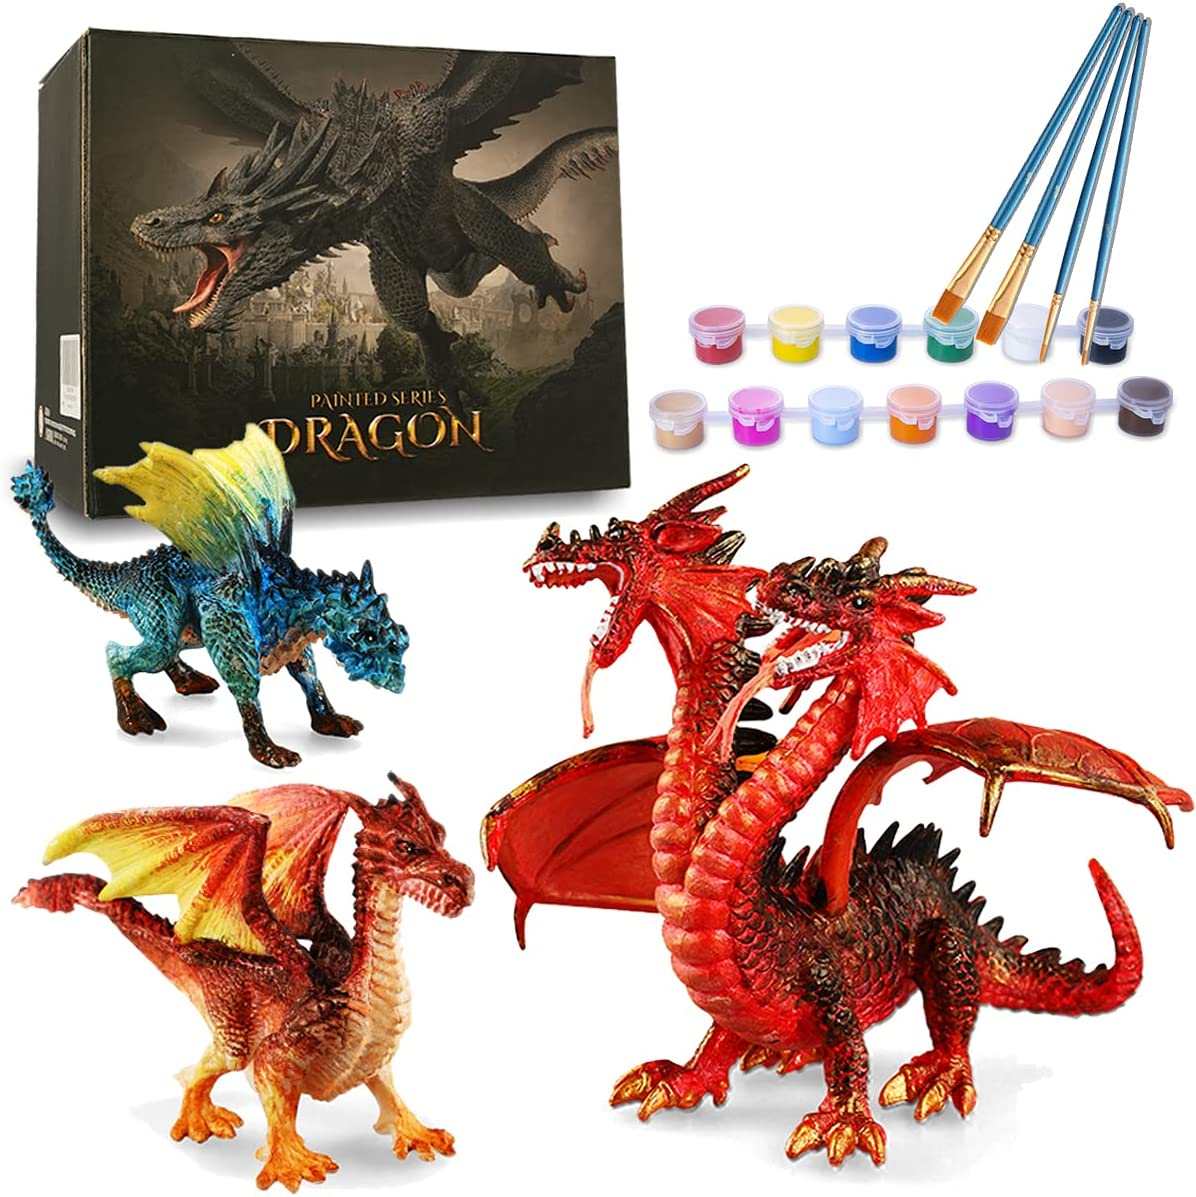 23. DIY 3D Dragon Painting Craft Kit